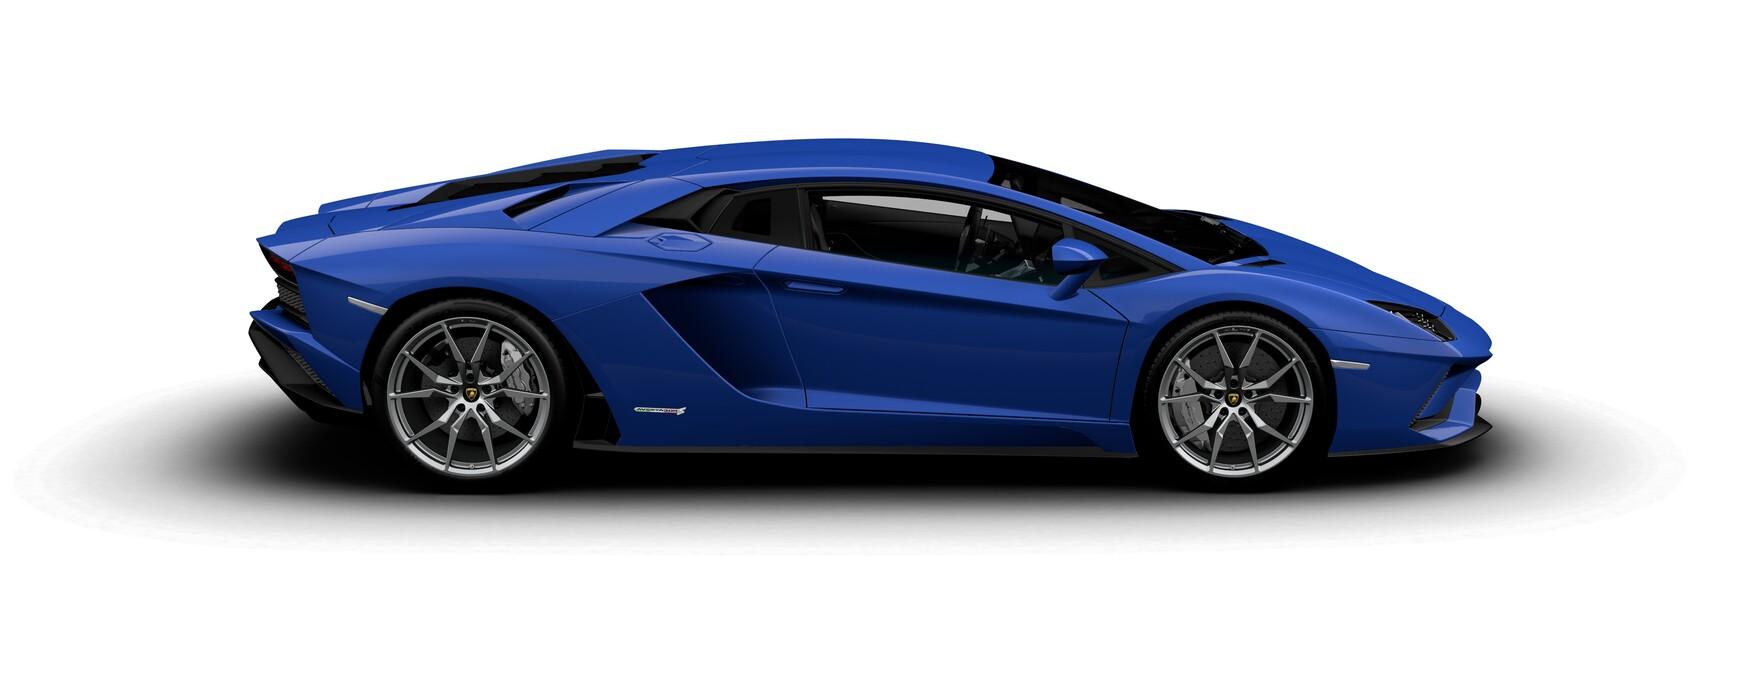 Lamborghini Aventador S Coupe metallic Blu Nereid side view